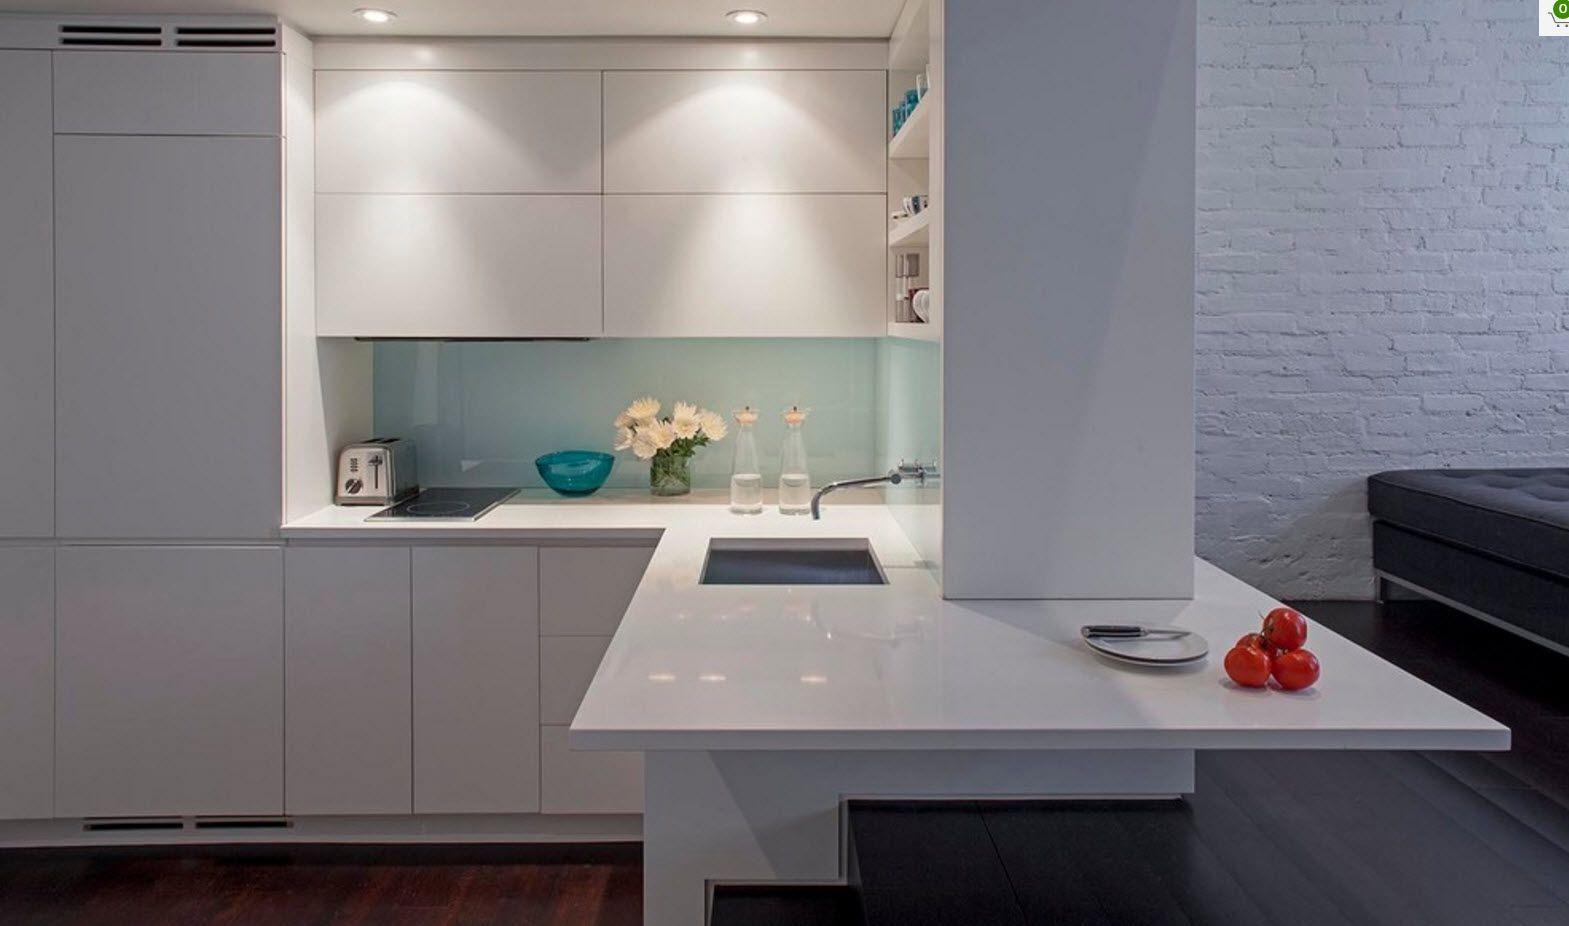 Apartment Interior Design Inspiration Ideas & Trends 2017. XXI centure trend - hi-tech plastic glance surfaces for kitchen